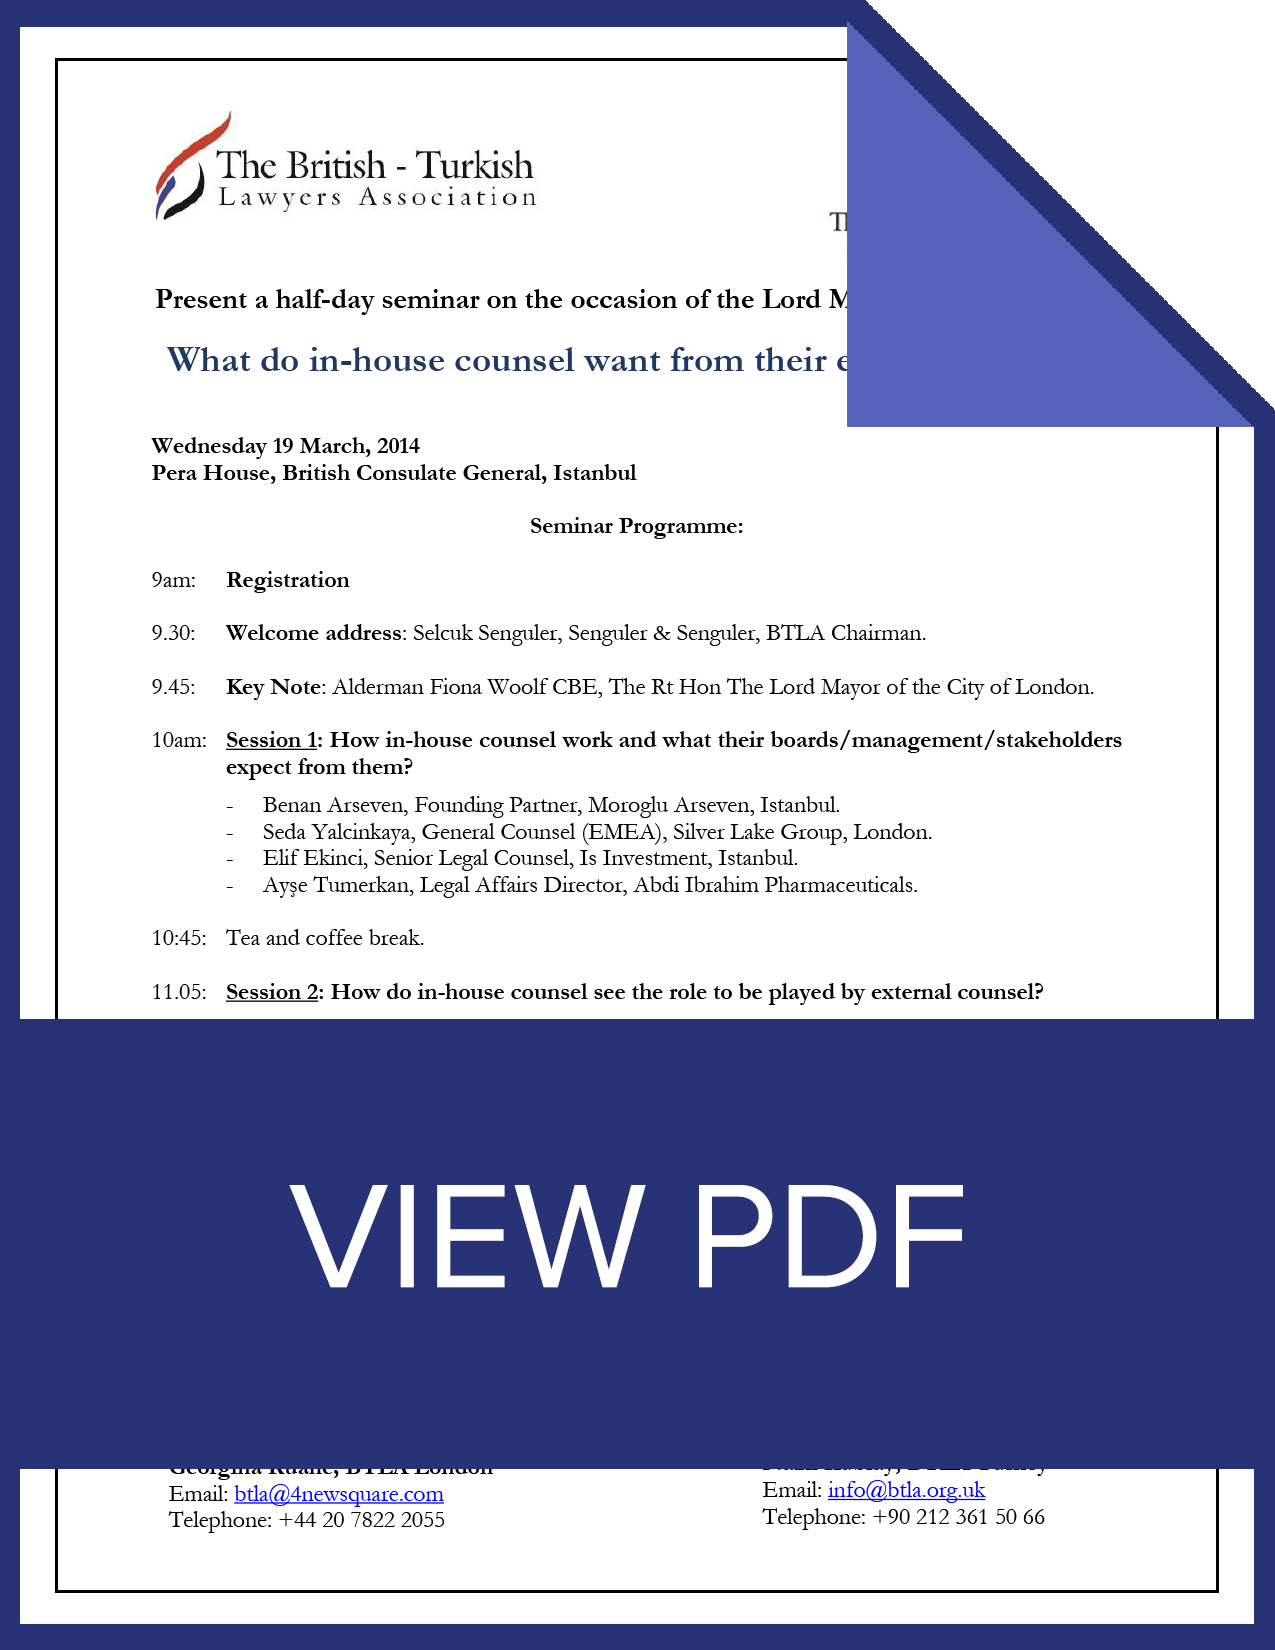 BTLA PDF Icon 3.png